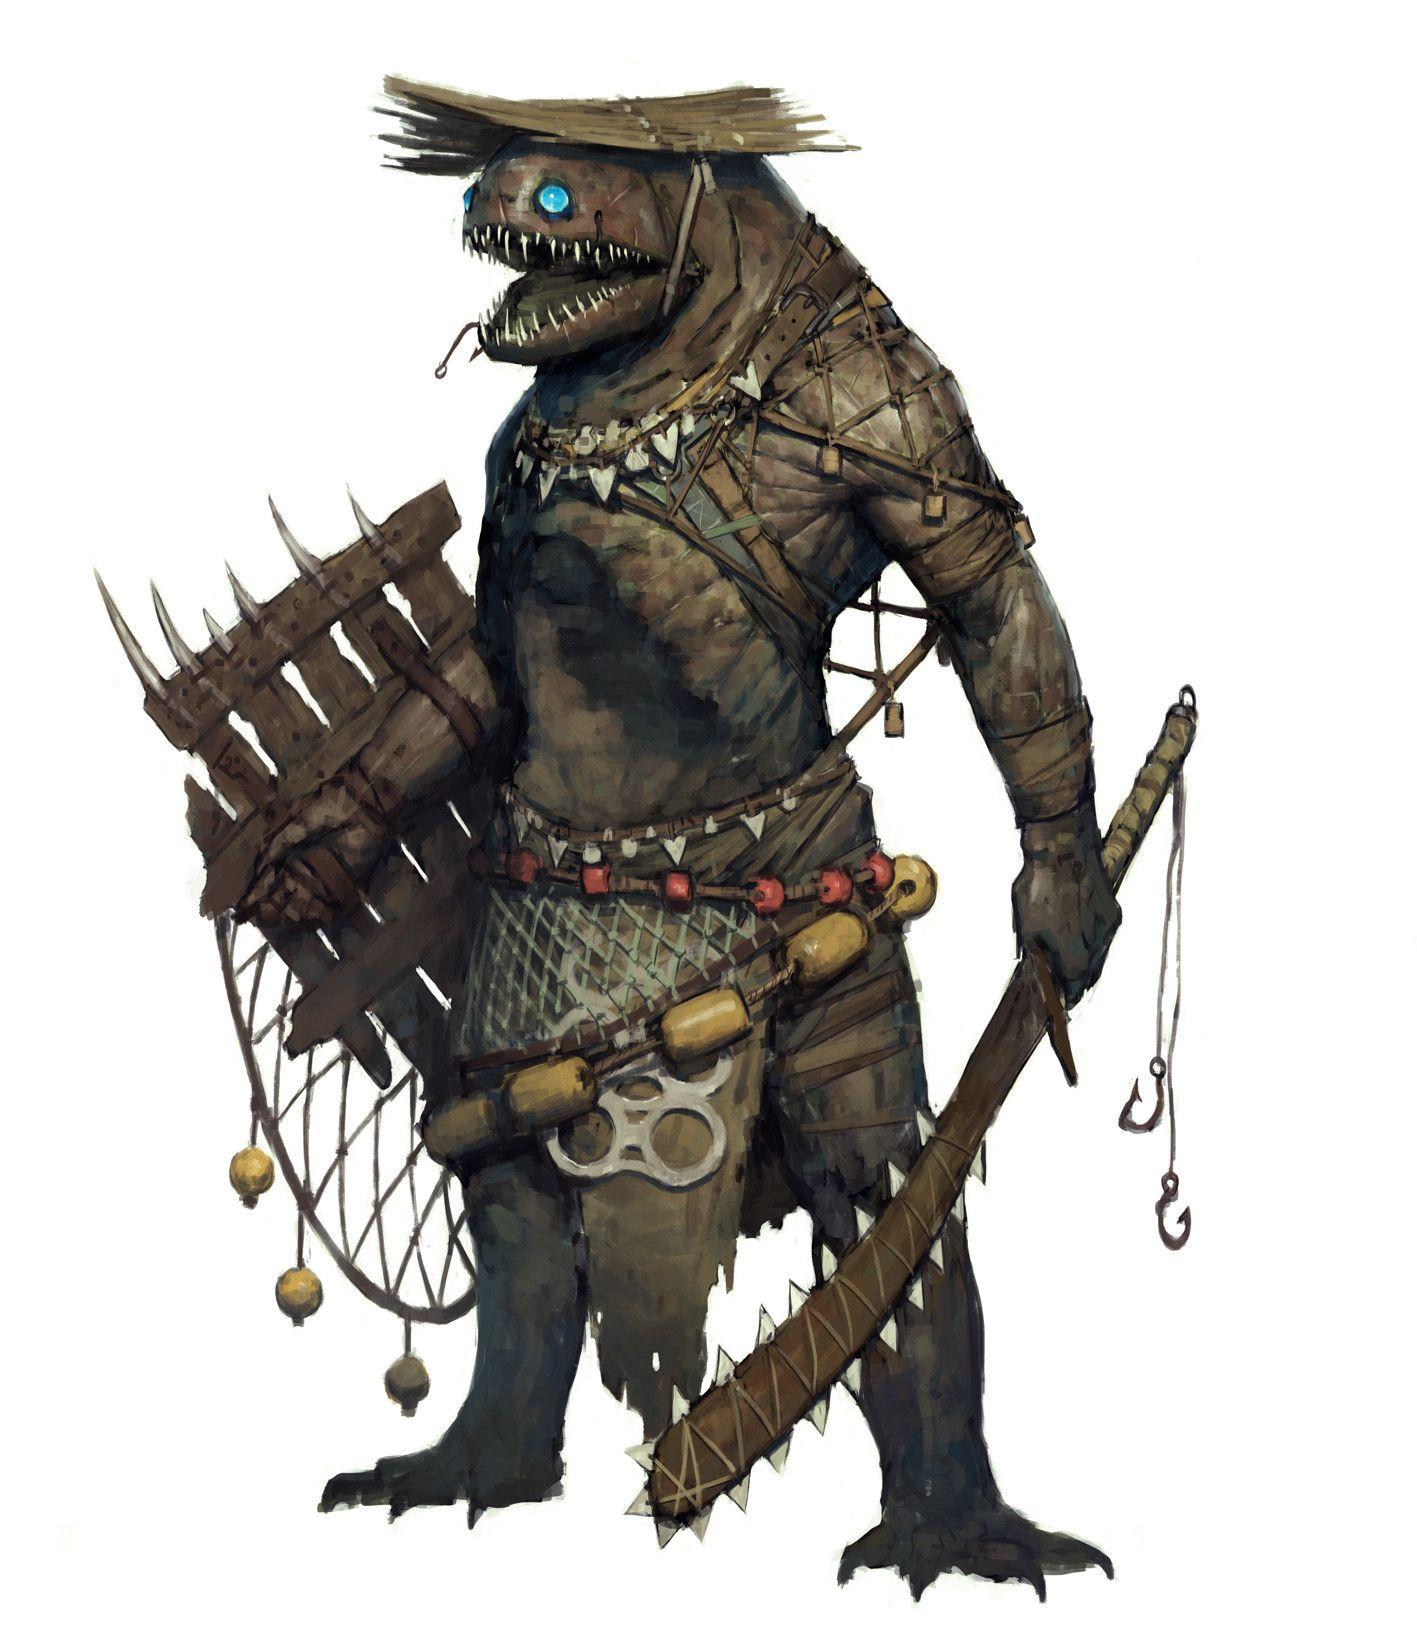 ArtStation - Fish Warrior, Ariel Perez